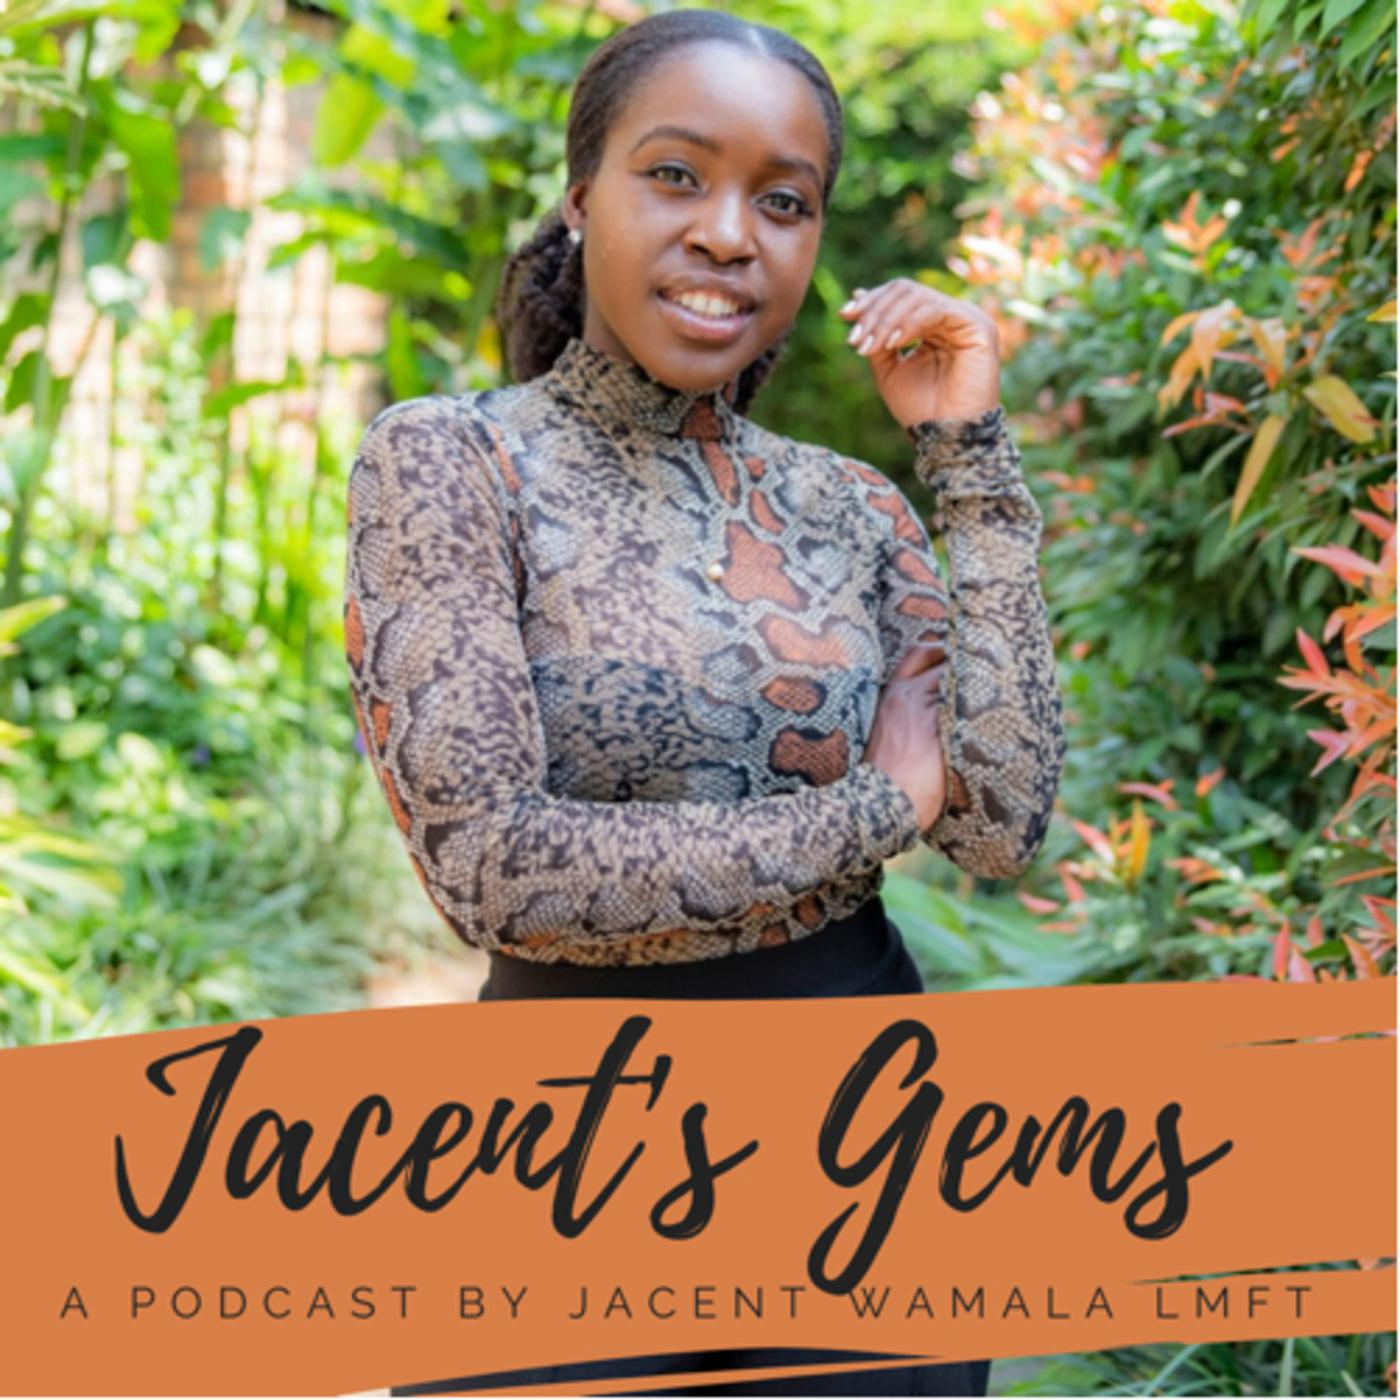 Jacent's Gems (podcast) - Jacent | Listen Notes